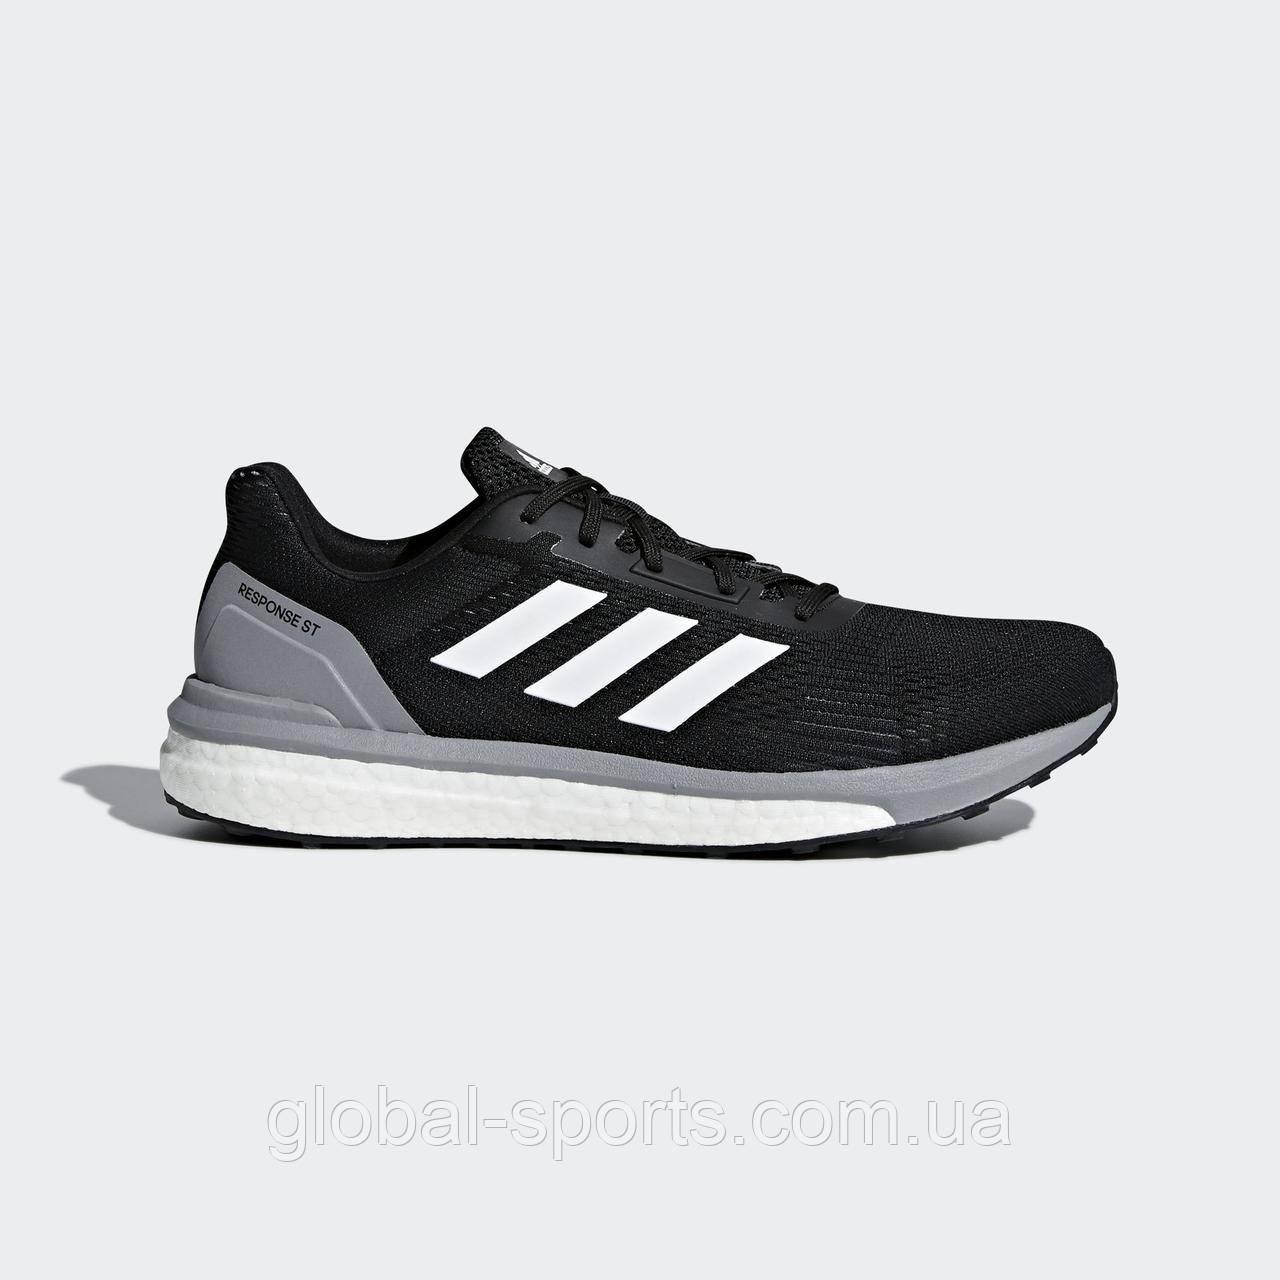 Мужские кроссовки для бега Adidas Response ST(Артикул:CG4003)